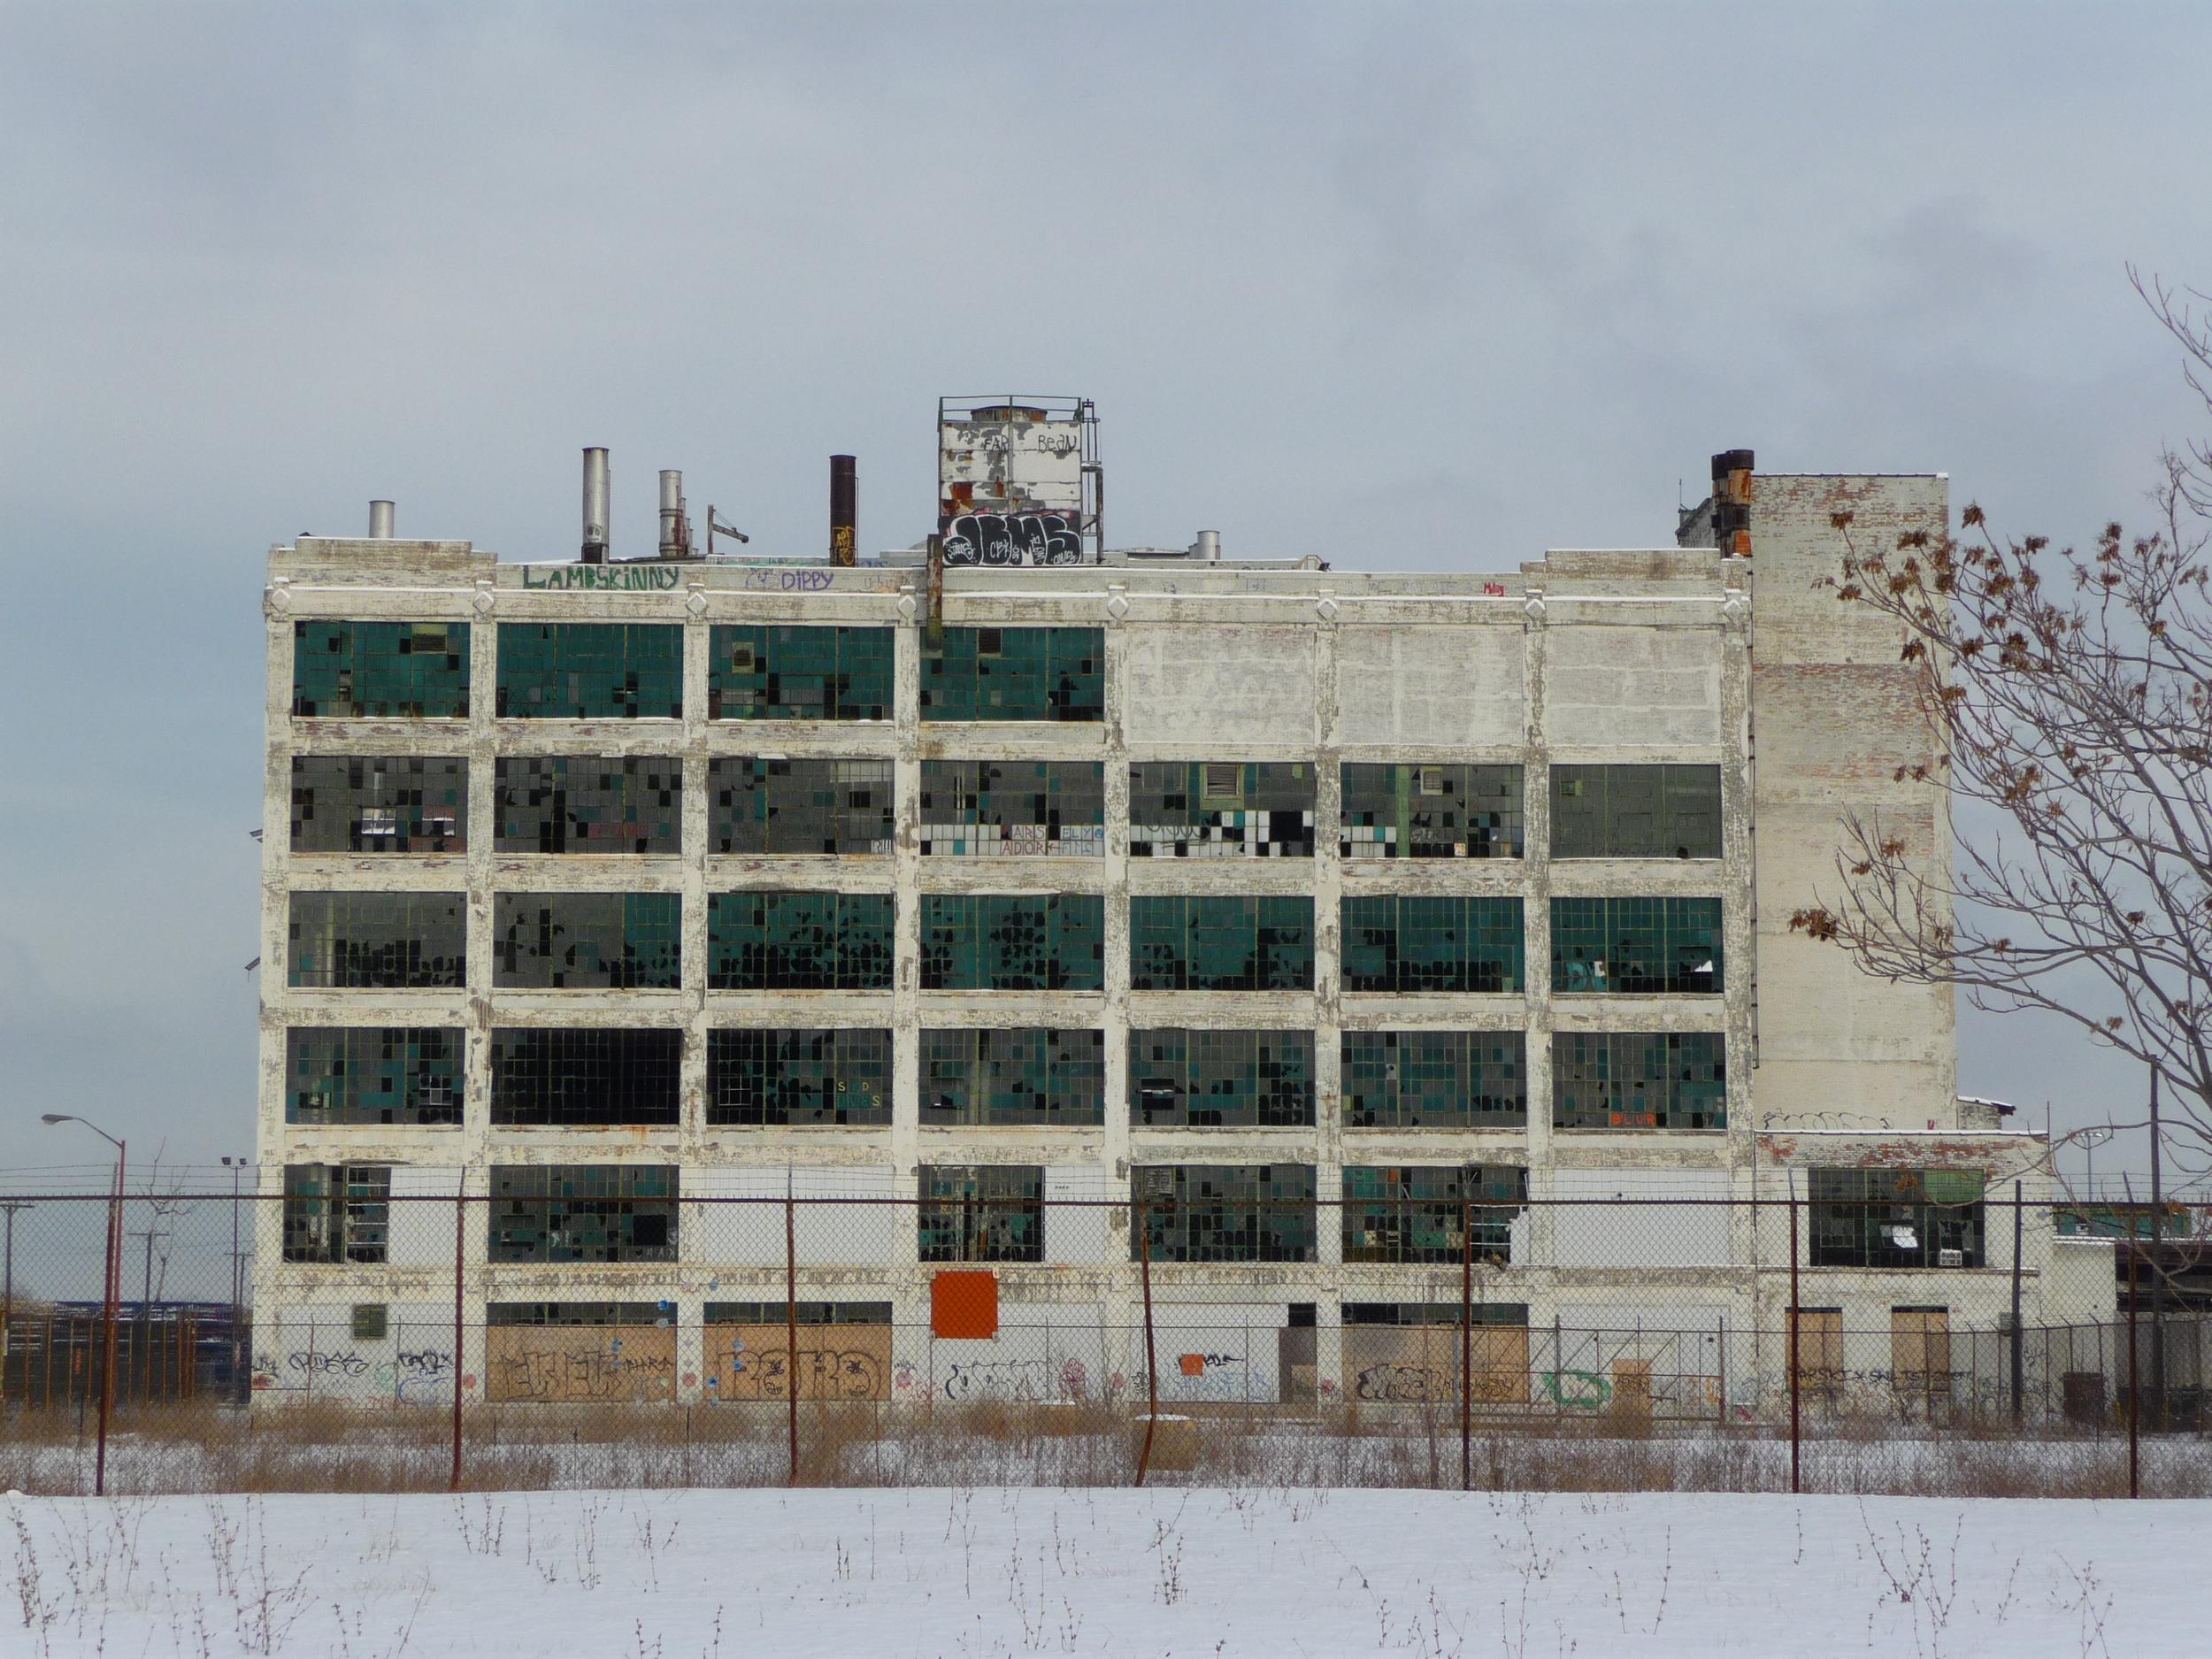 Fischer Body Plant in Flint, MI. By Patrickklida (Own work), via Wikimedia Commons